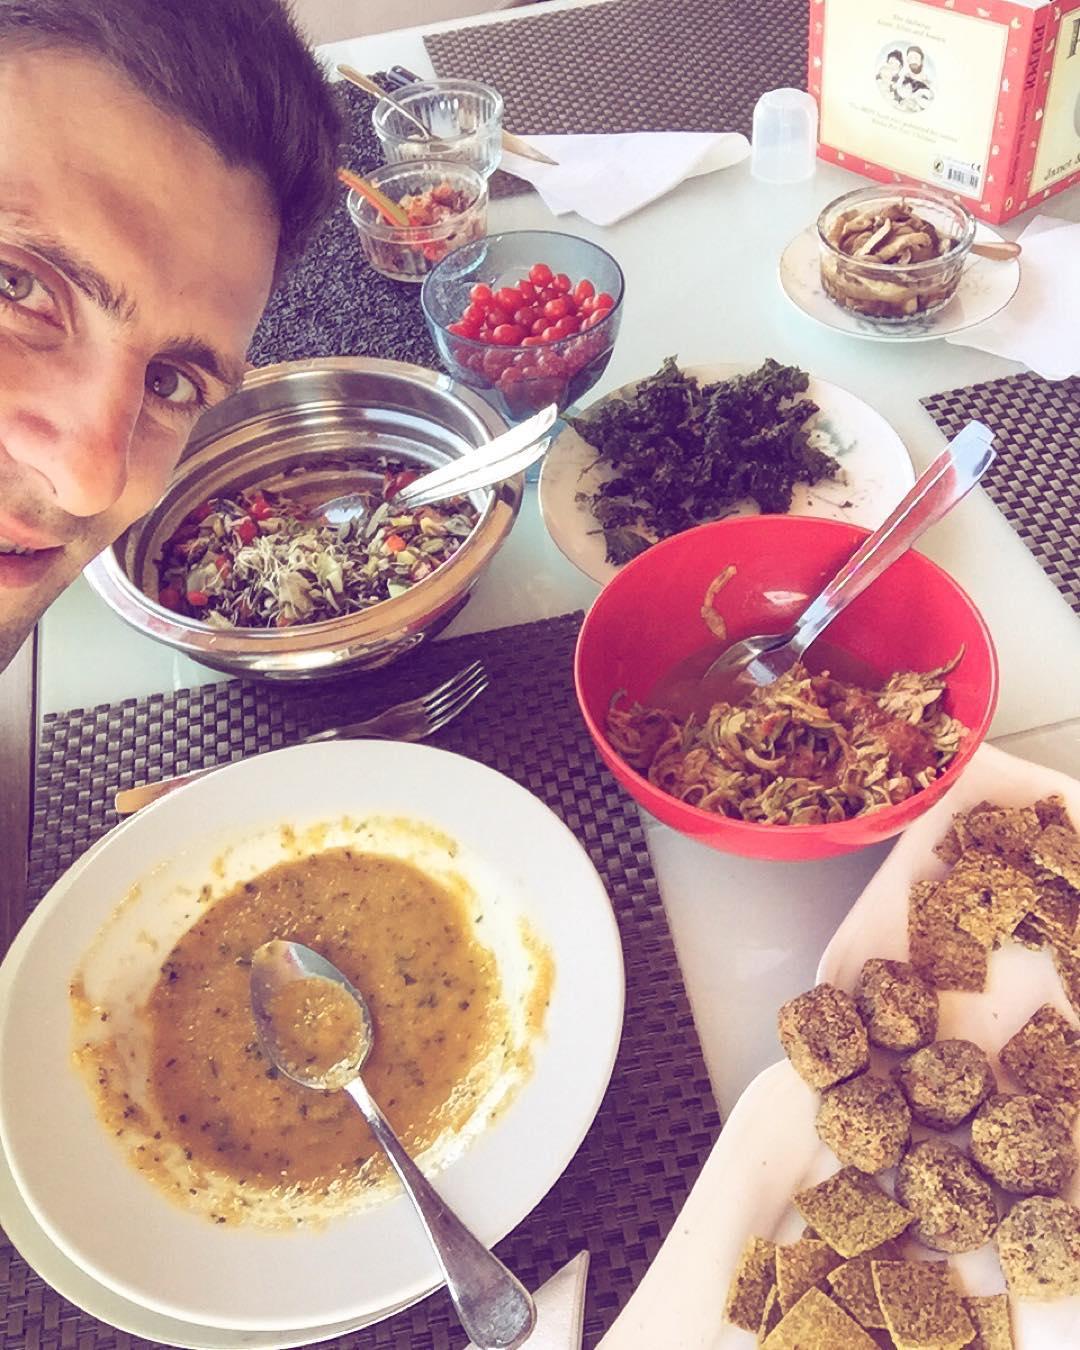 Novak's Diet